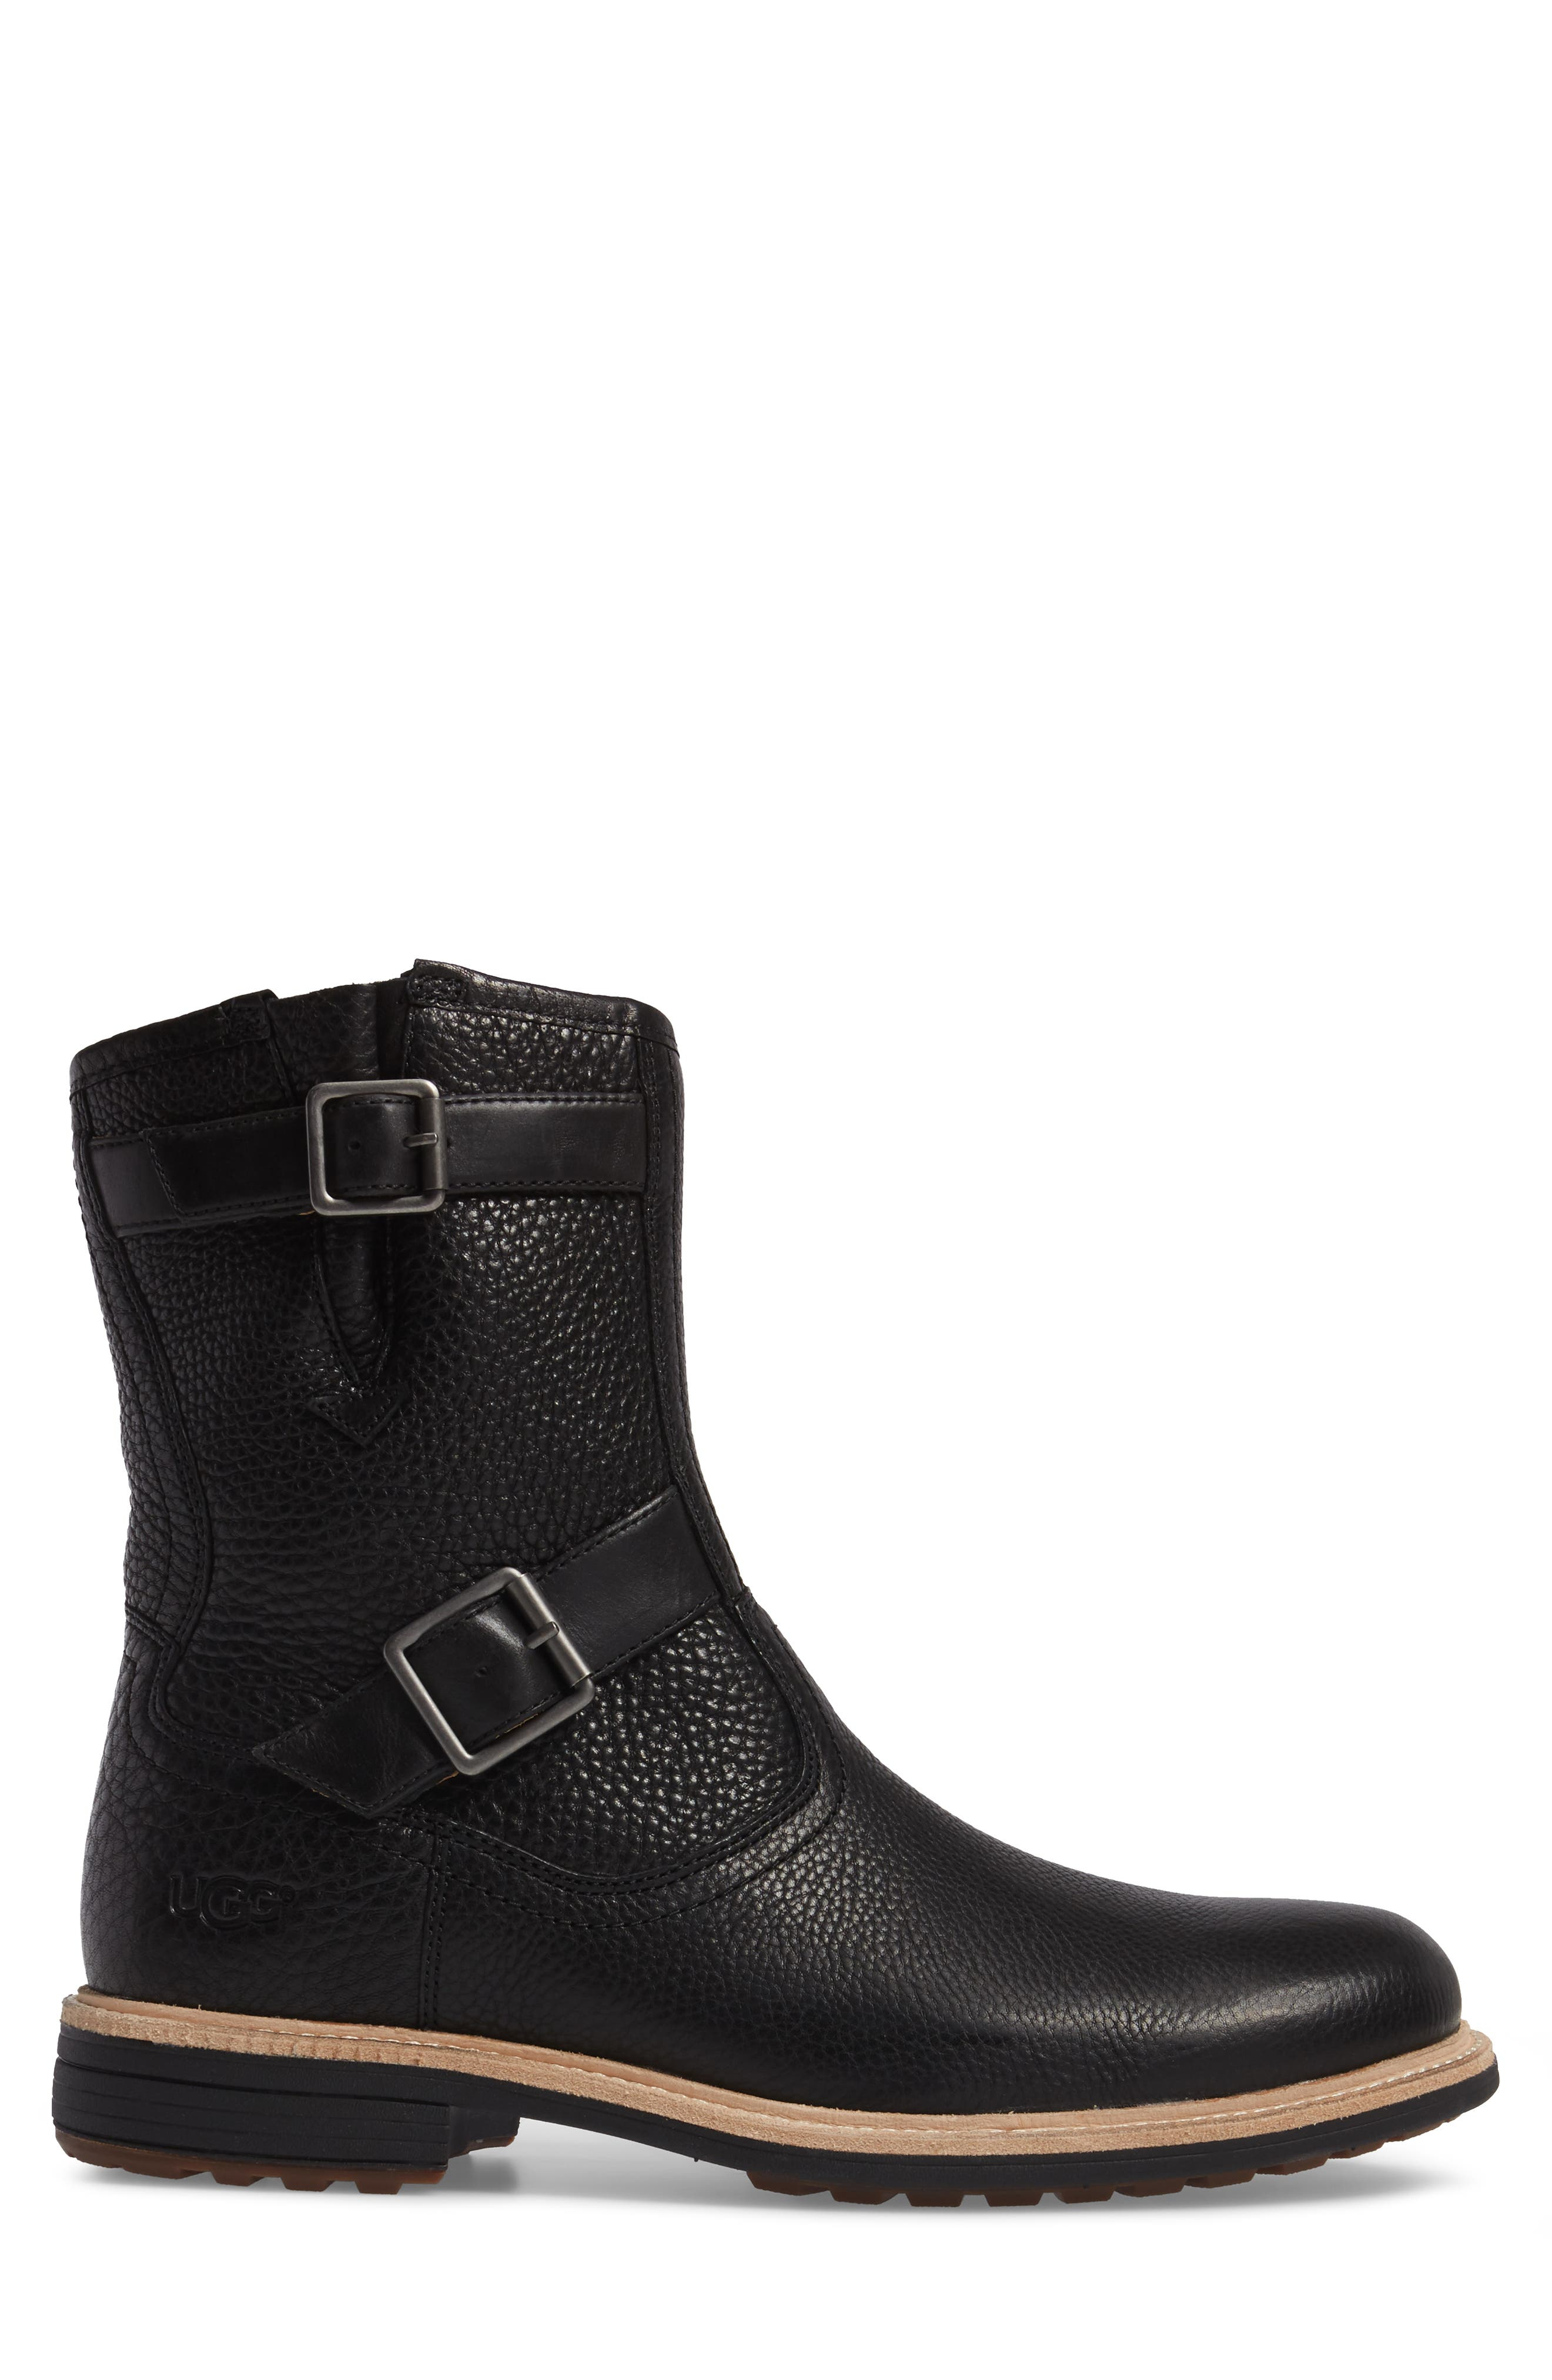 Jaren Zip Boot with Genuine Shearling,                             Alternate thumbnail 3, color,                             Black